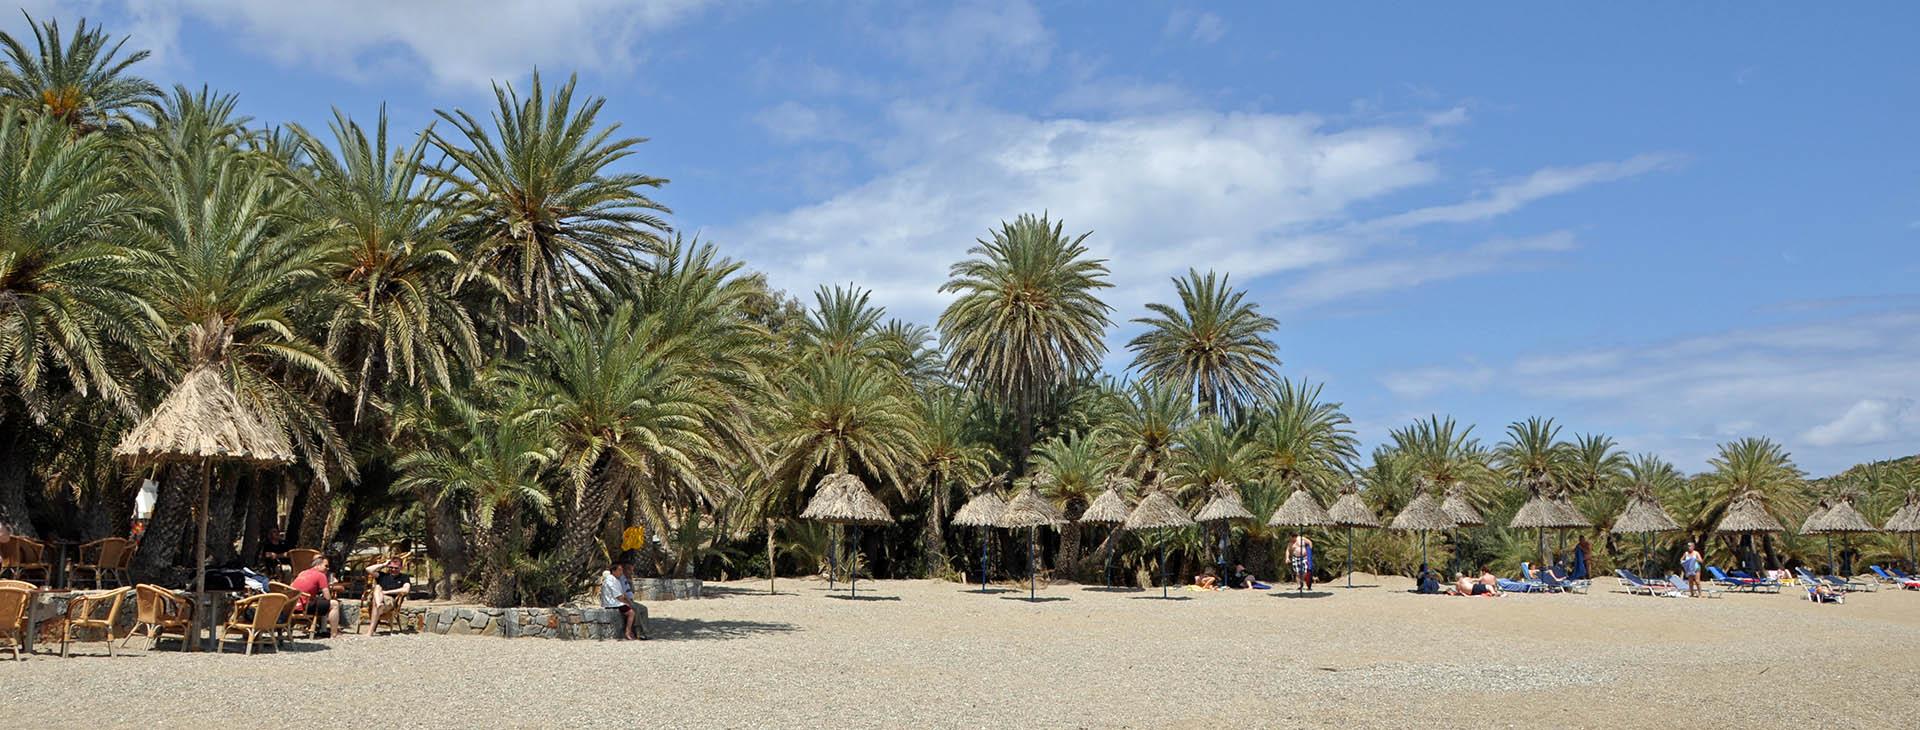 Vai palm forest & beach, Lassithi